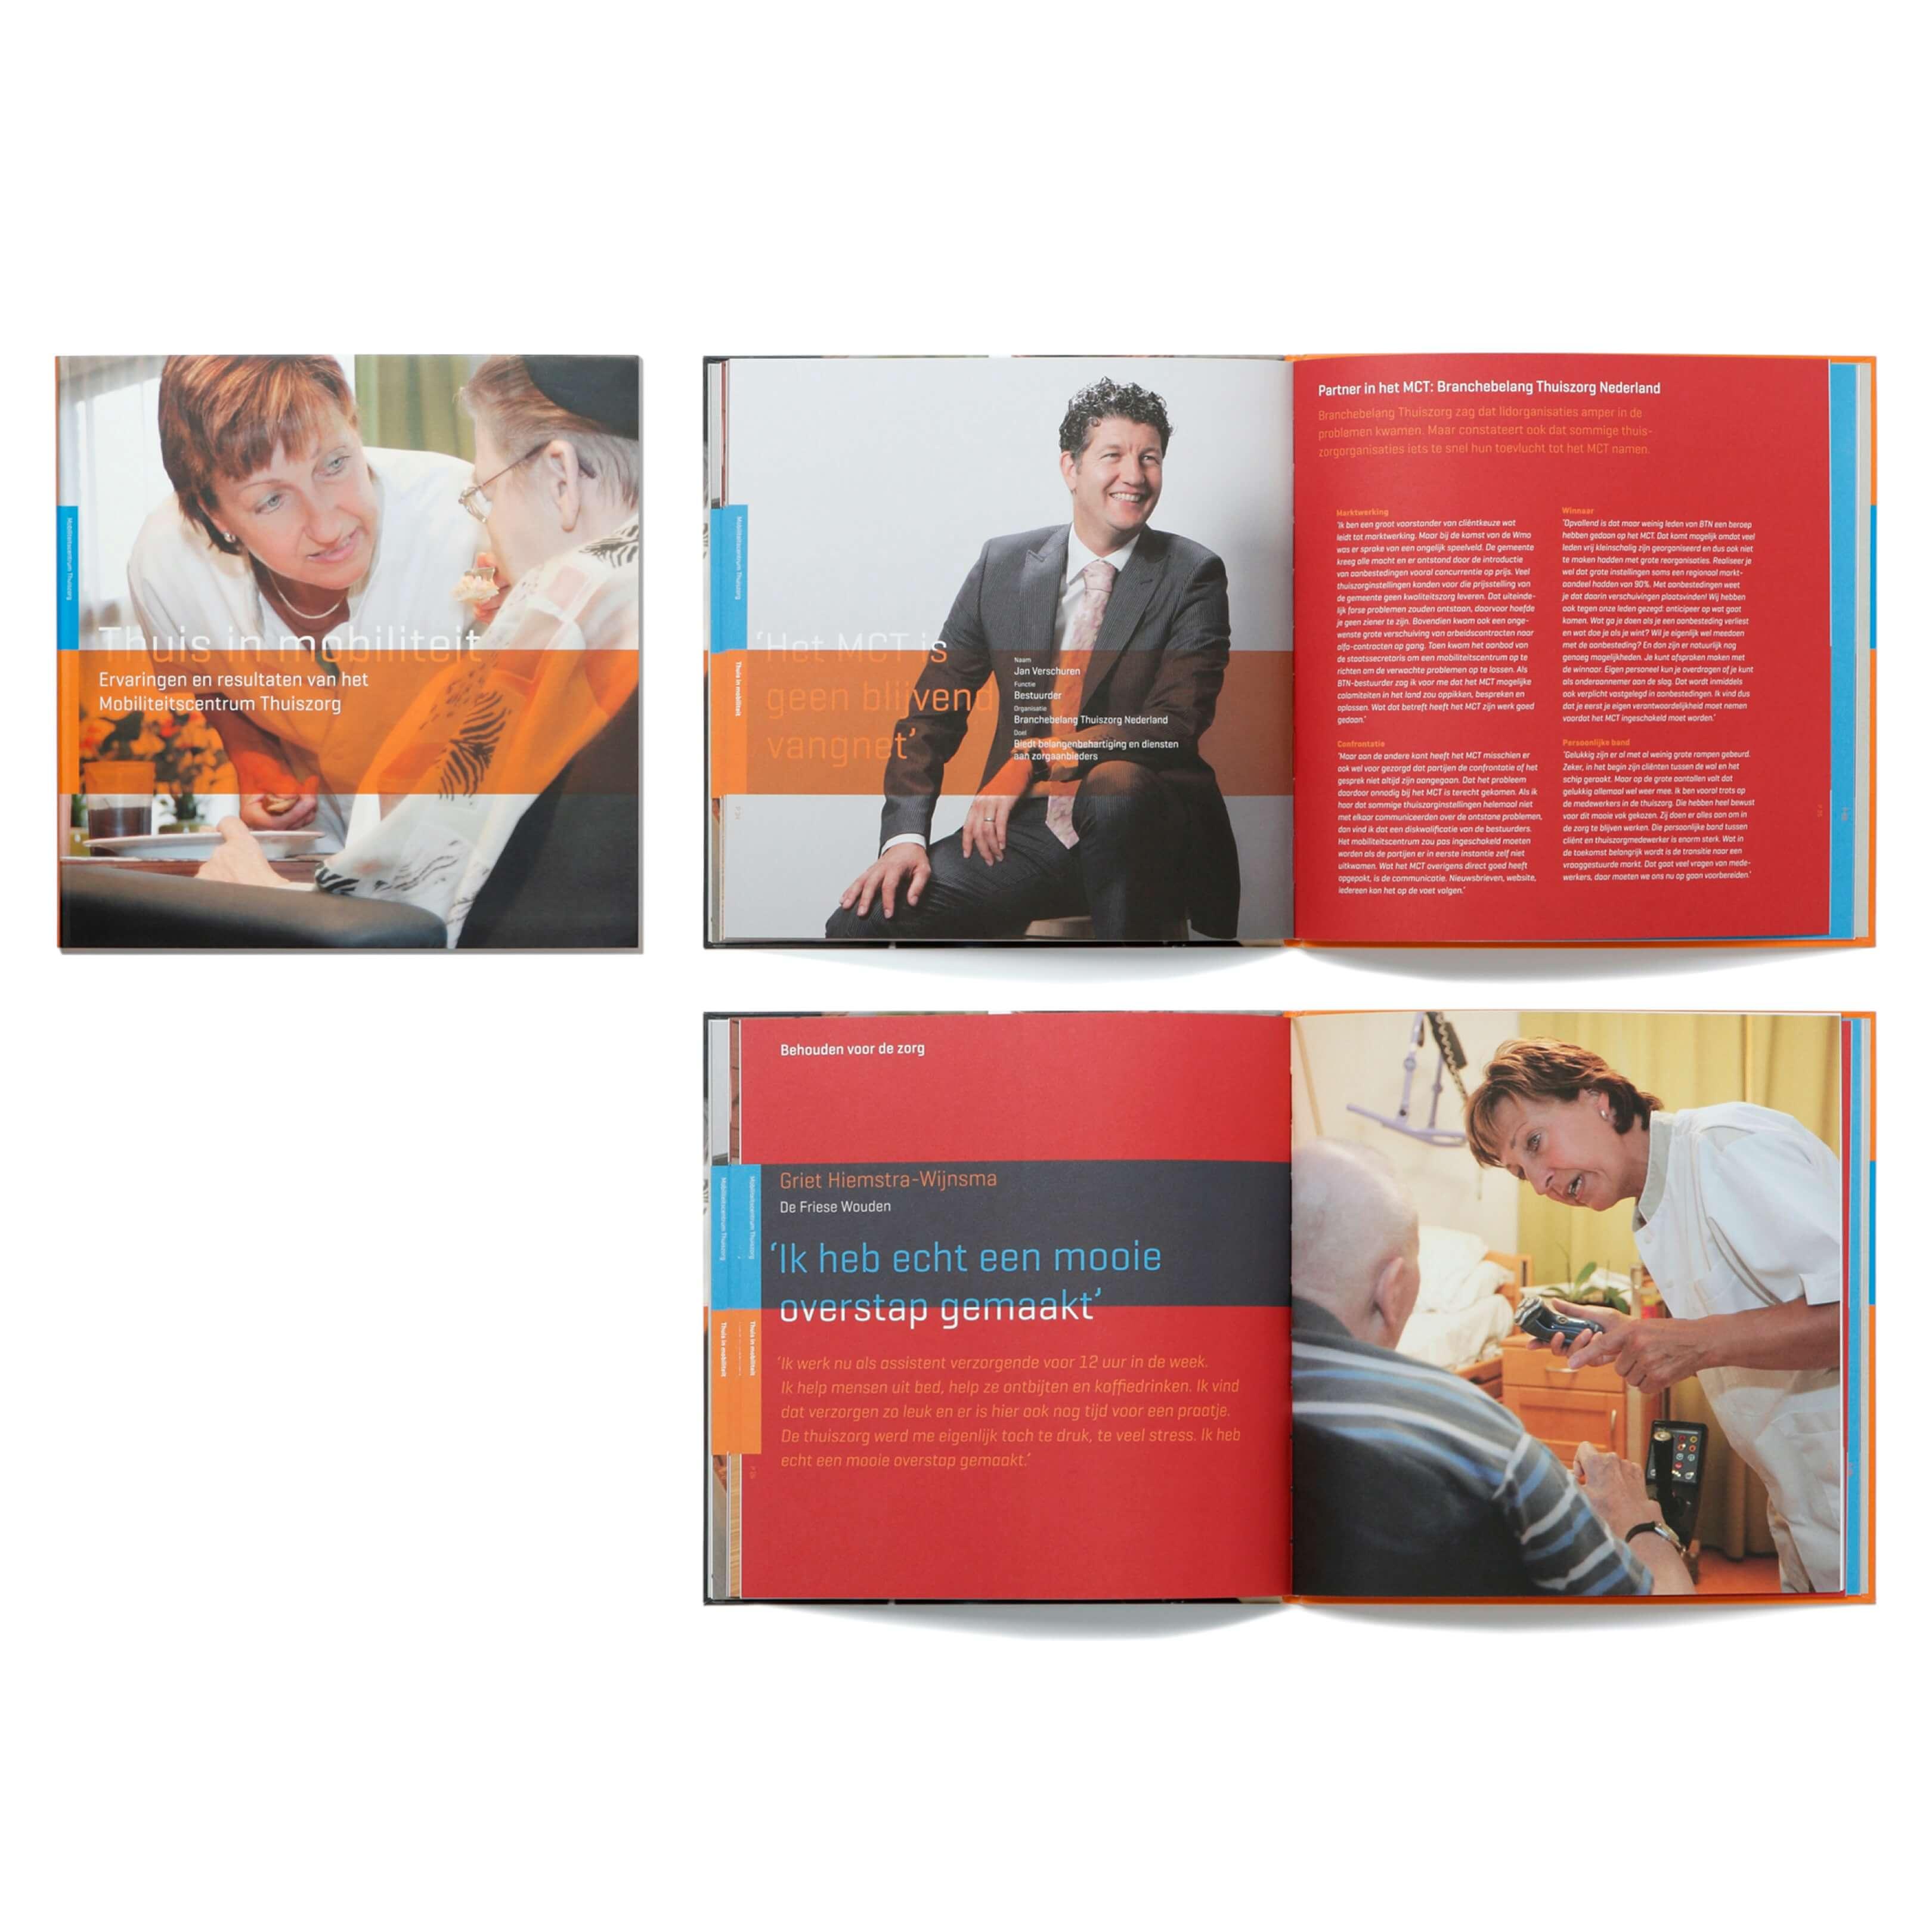 Jurjen Poeles Fotografie boek Thuis in mobiliteit Smitswater UWV Werkbedrijf portret studio reportage